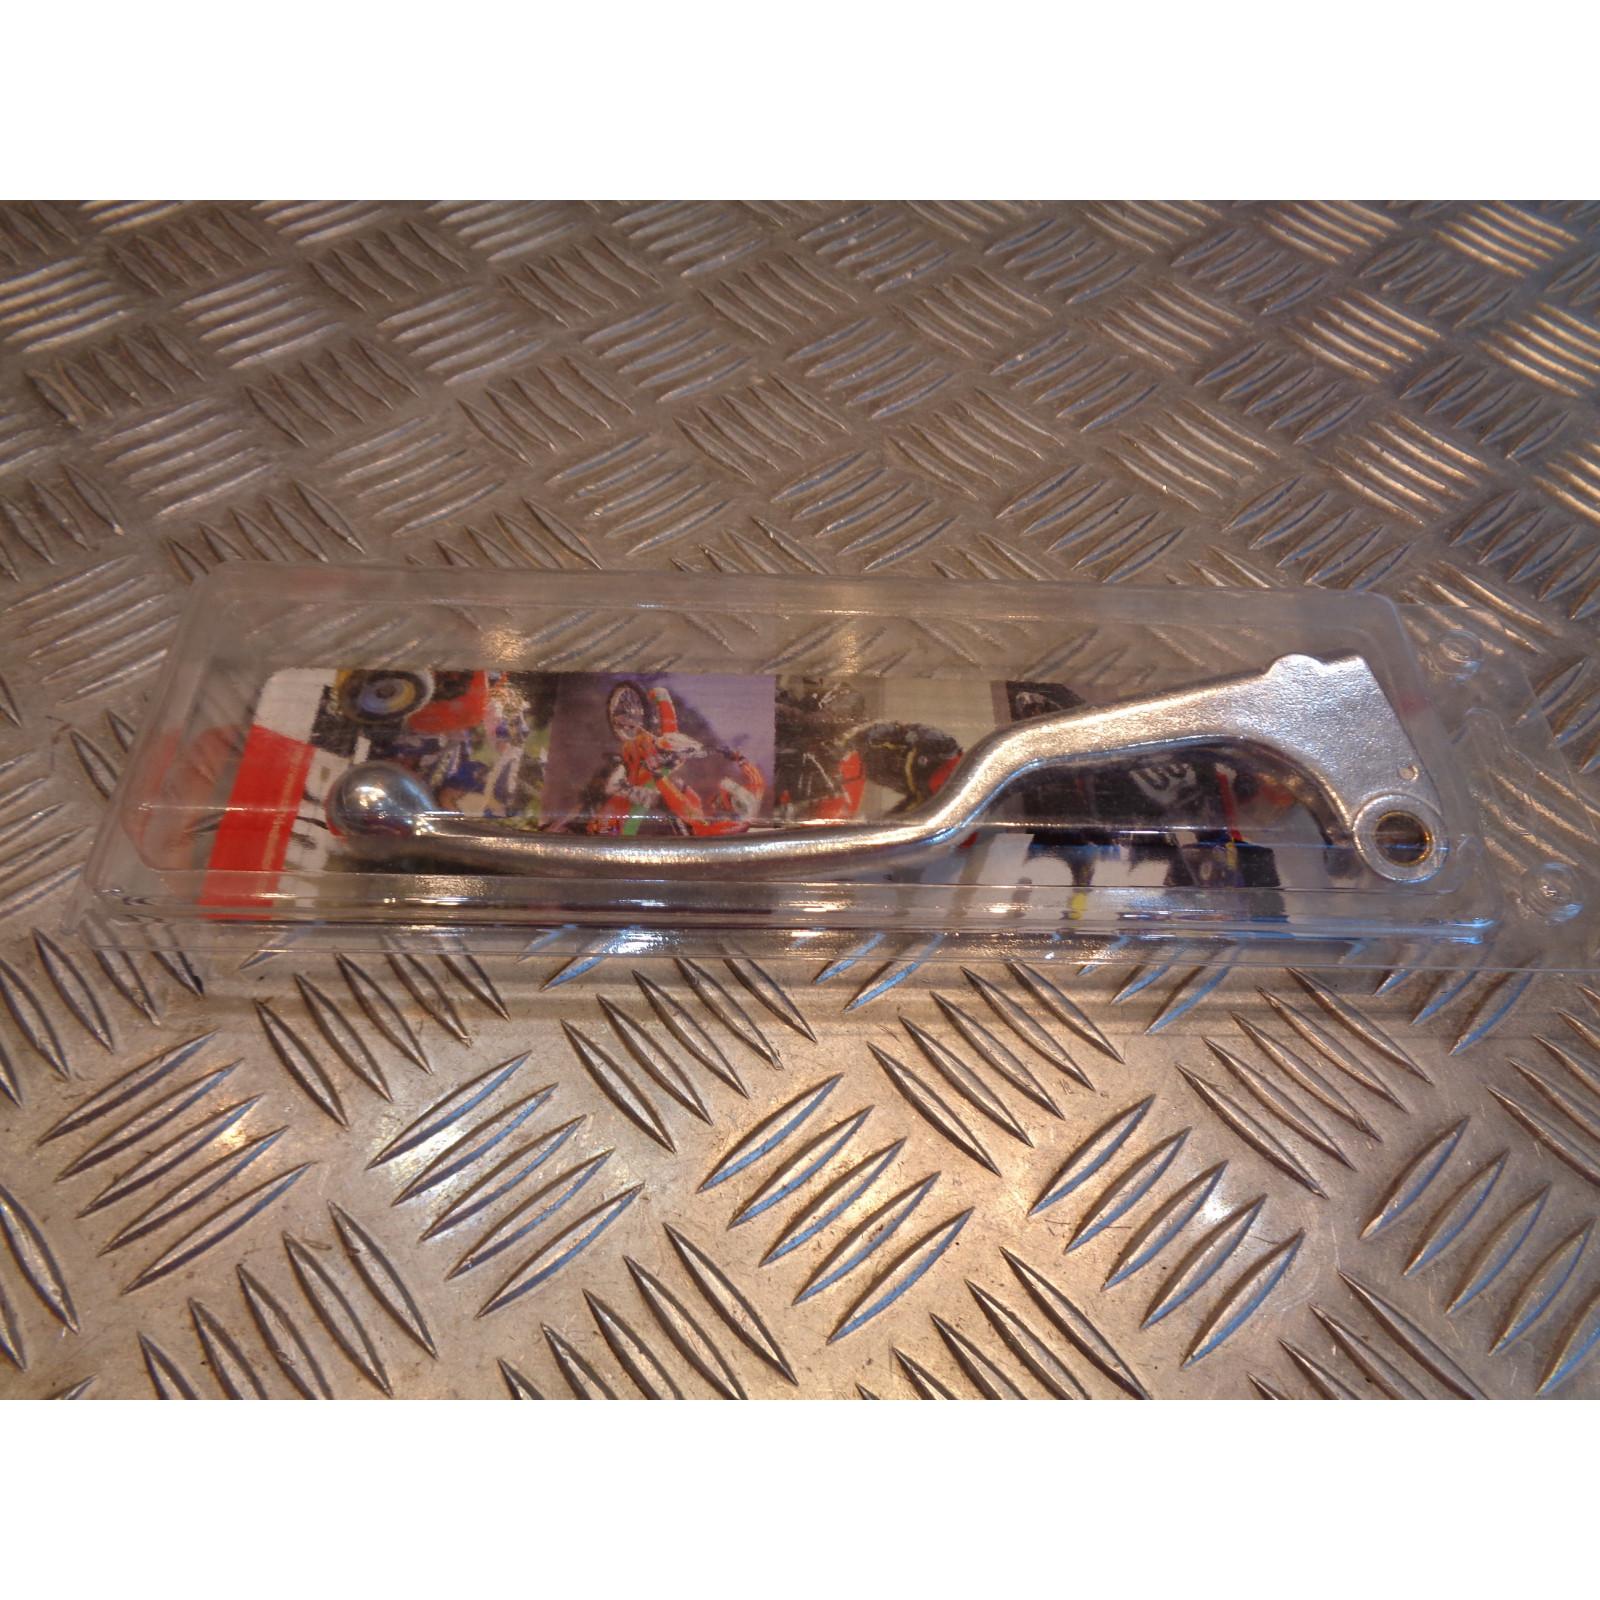 levier embrayage type origine alu moto cb 600 f hornet 2007 - 10 53178-MFG-D01 bihr 870241